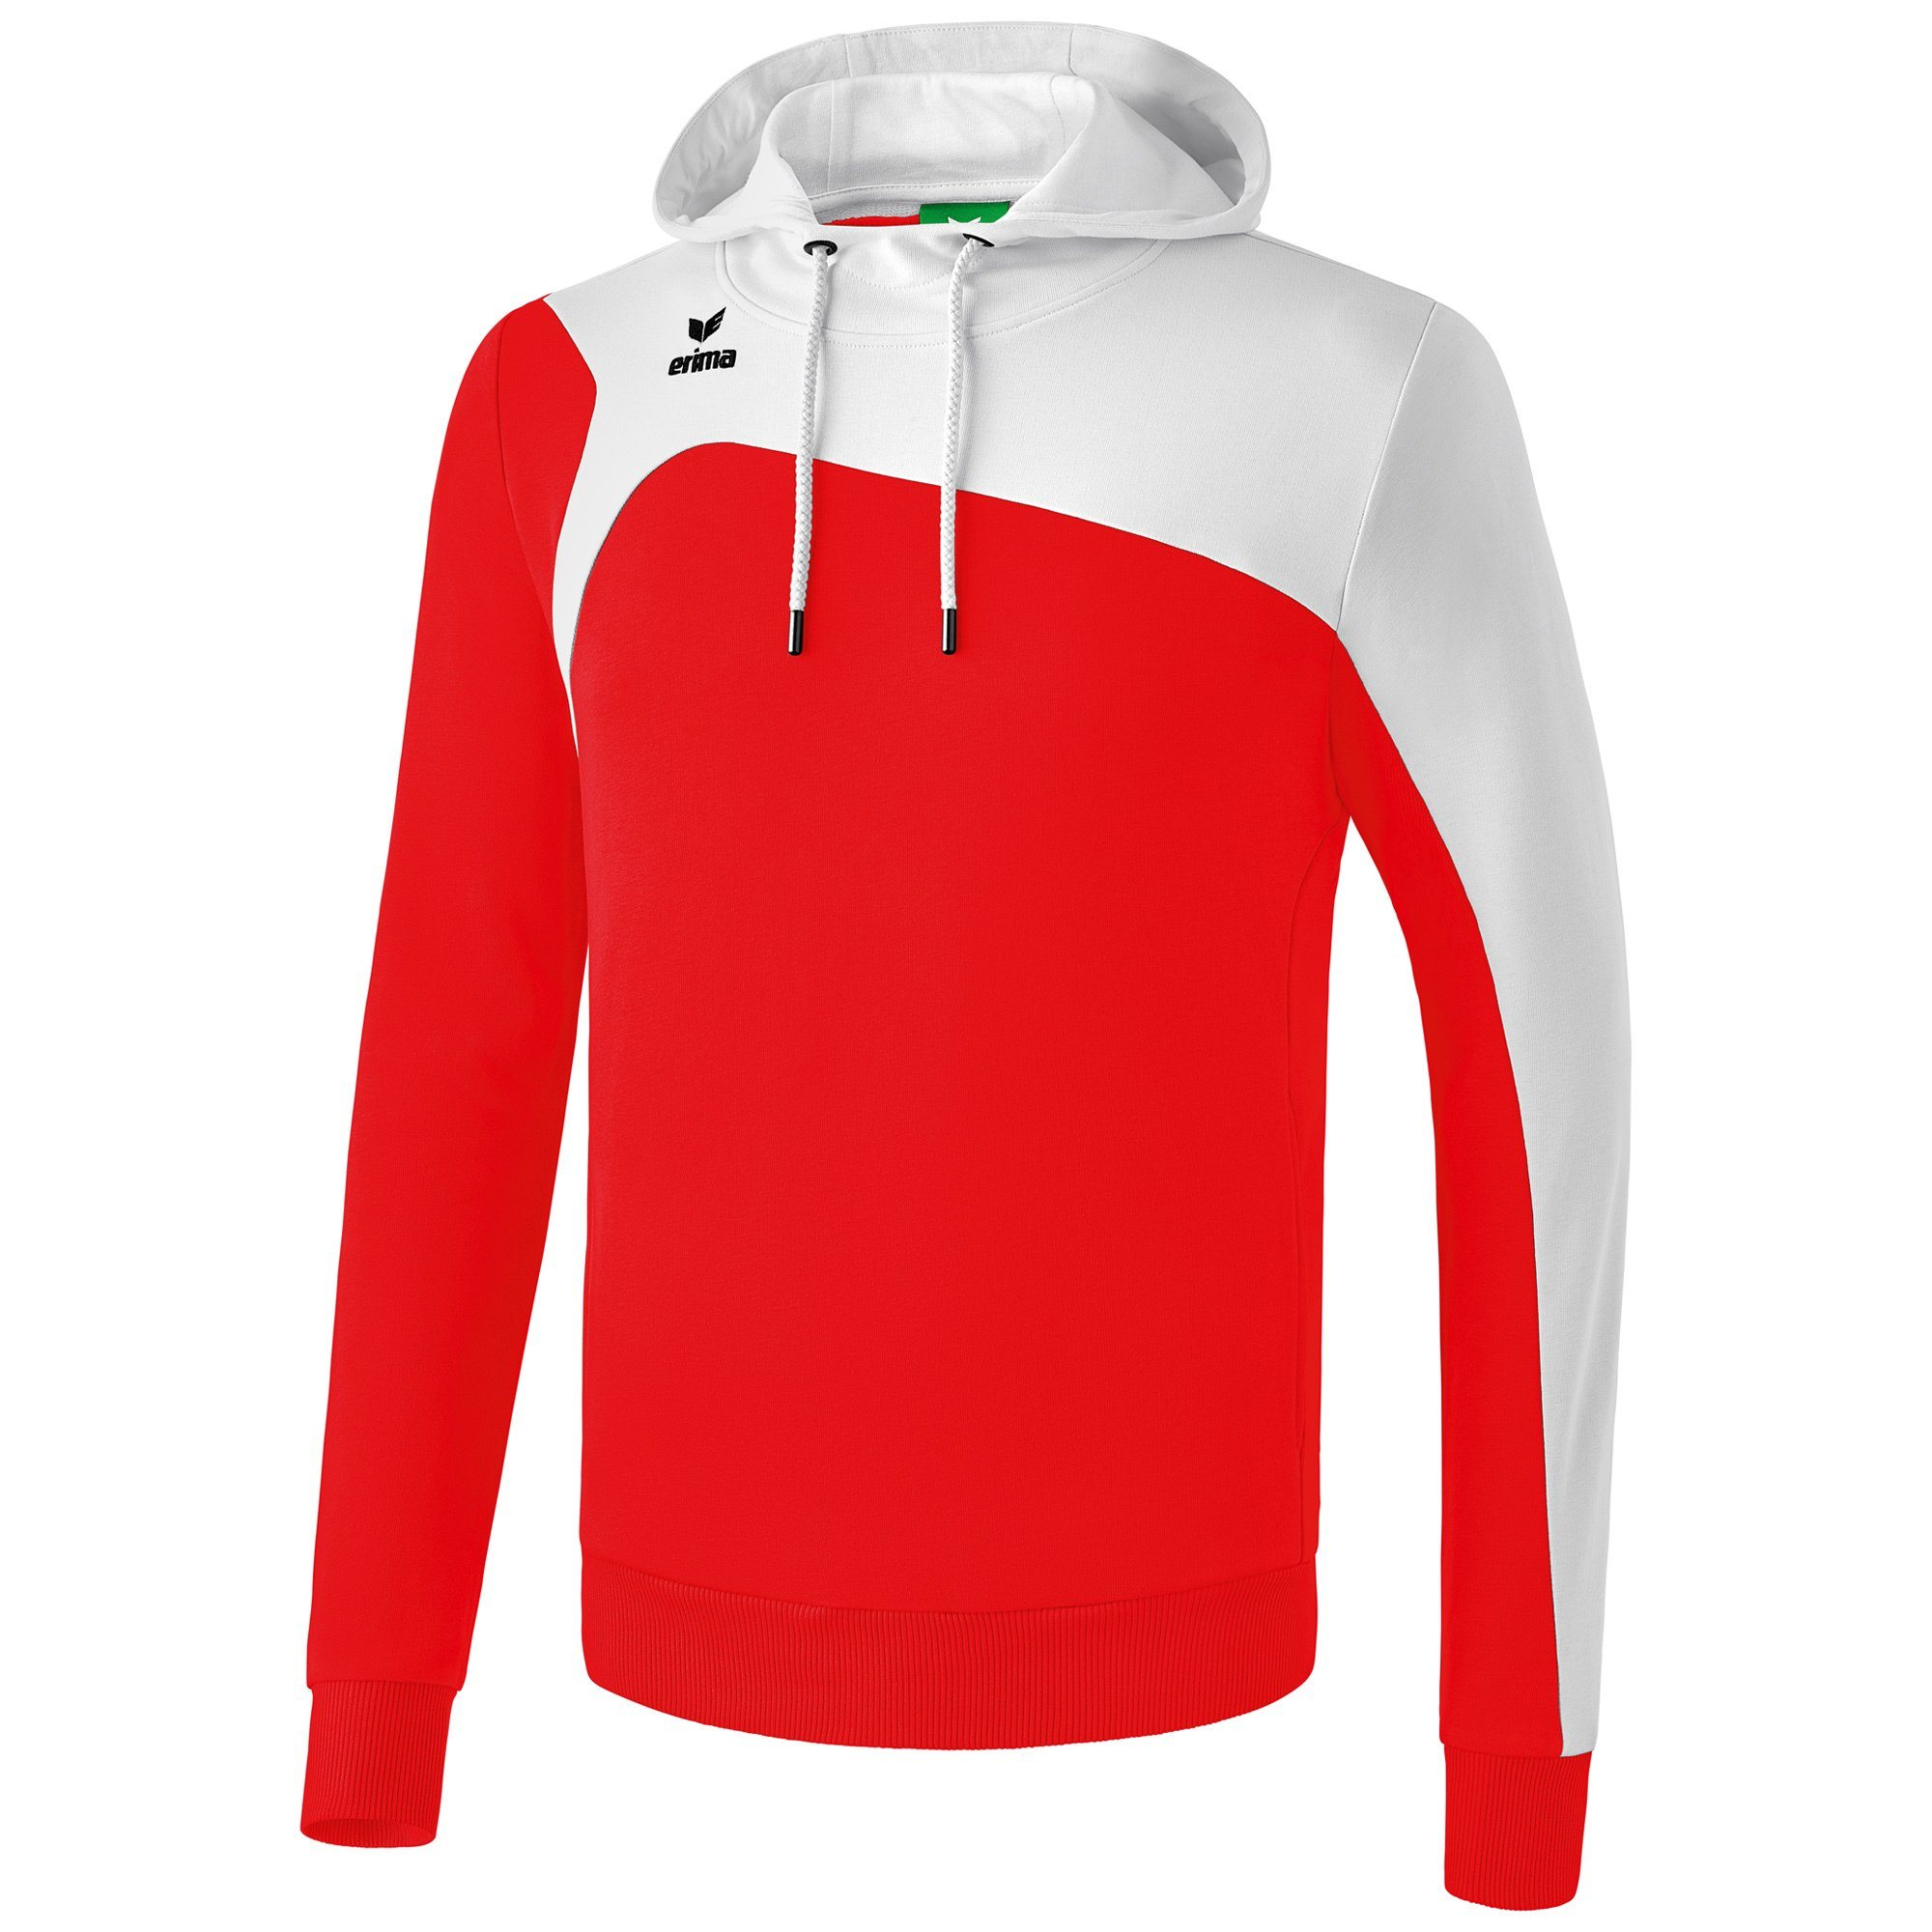 Erima Club 1900 2.0 Kapuzenpullover Herren   Bekleidung > Pullover > Kapuzenpullover   Baumwolle - Polyester   Erima